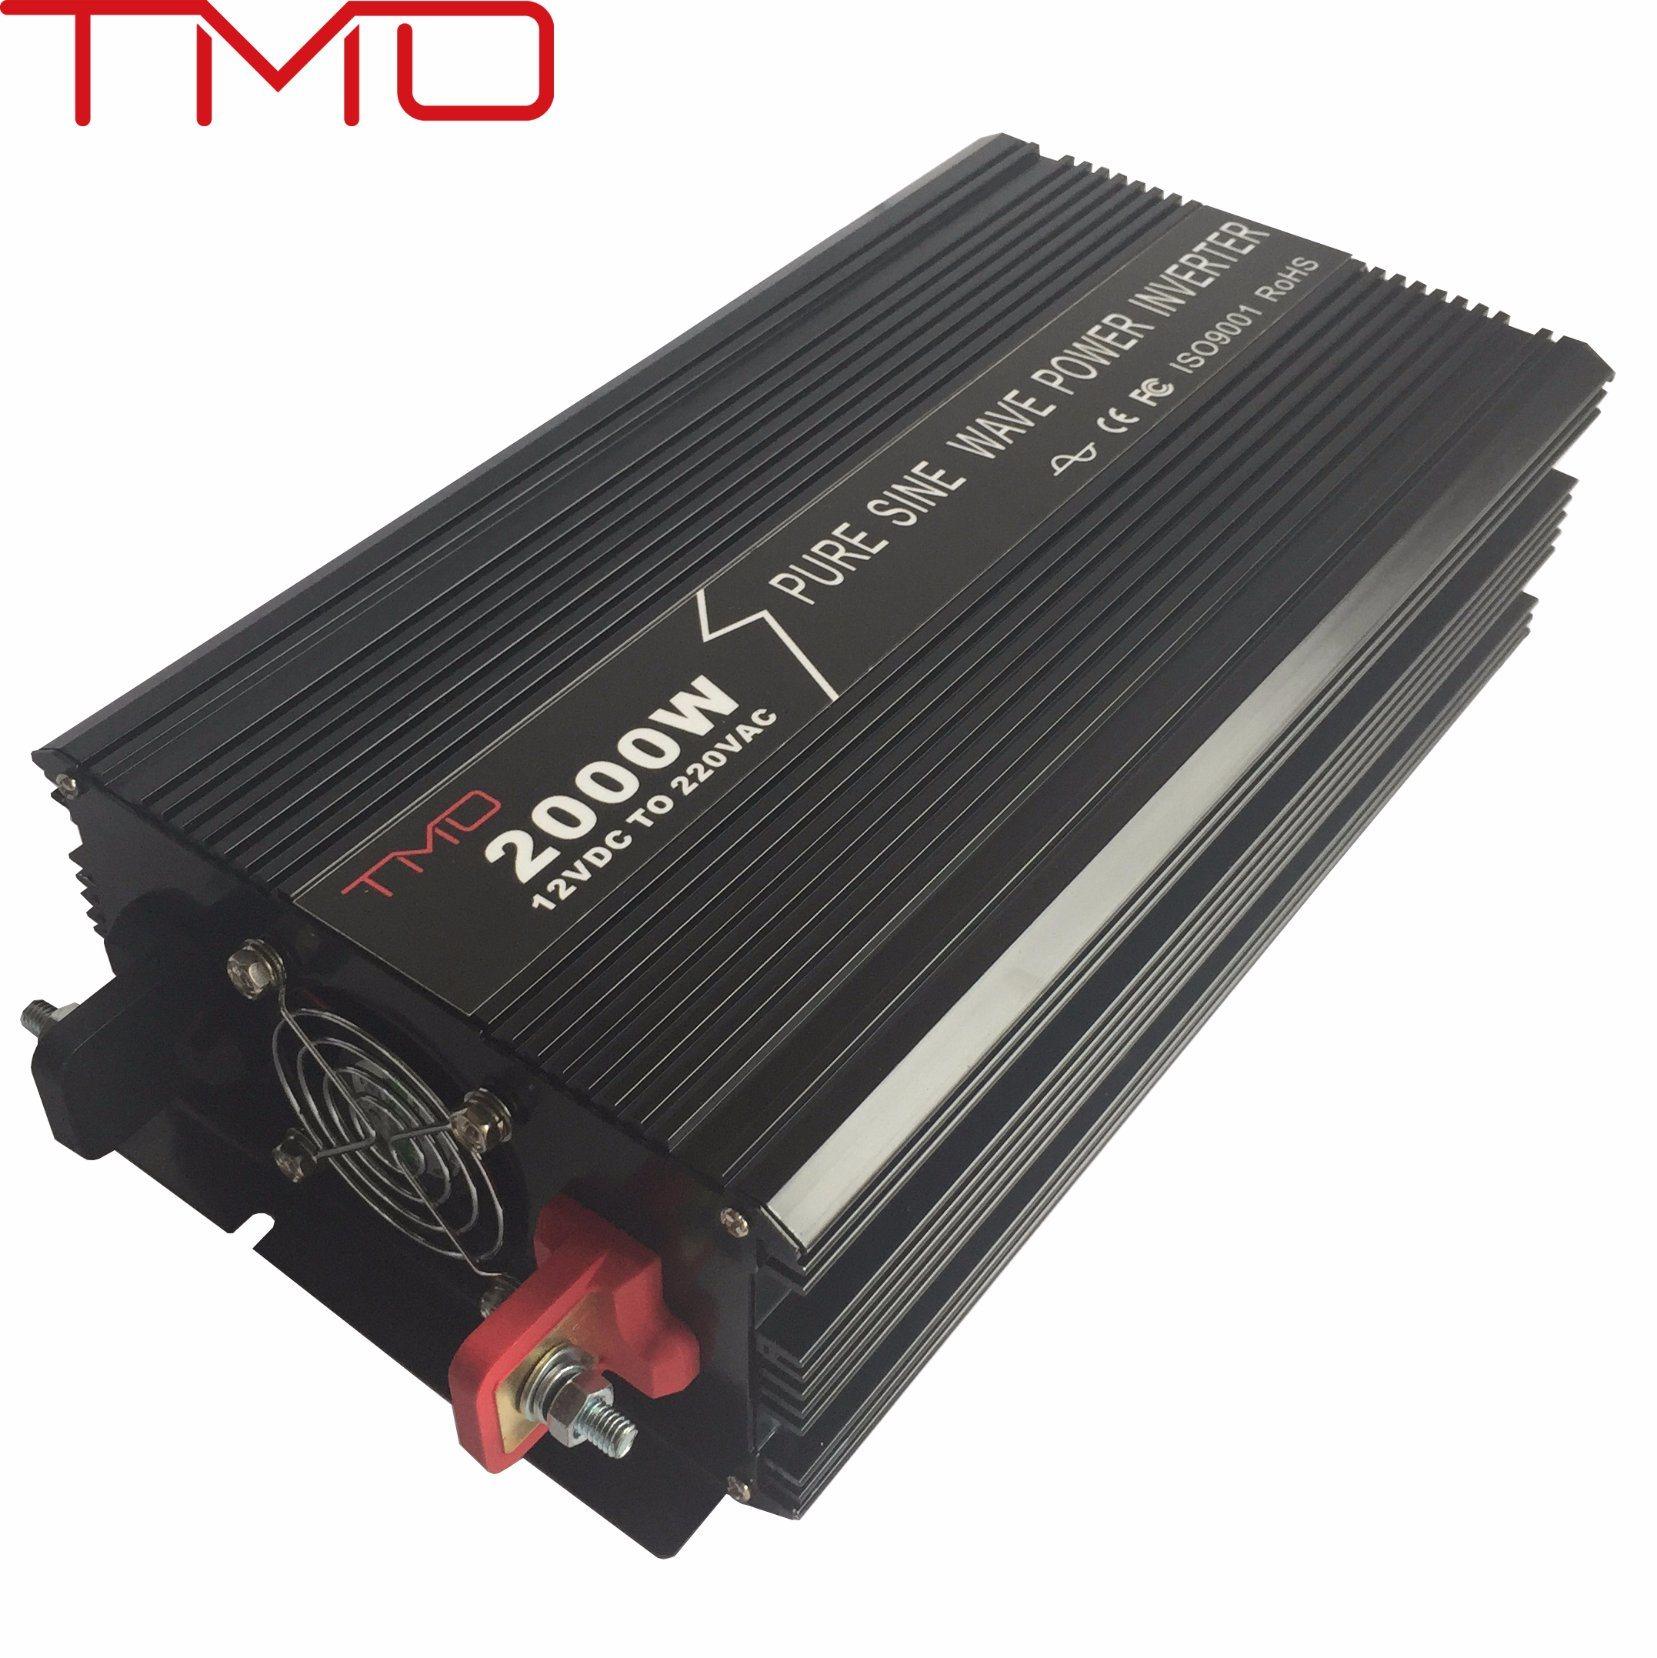 LED Display off Grid 2000 Watt/ 2kw/ 2kVA Pure Sine Wave Power Inverter 12V 220V